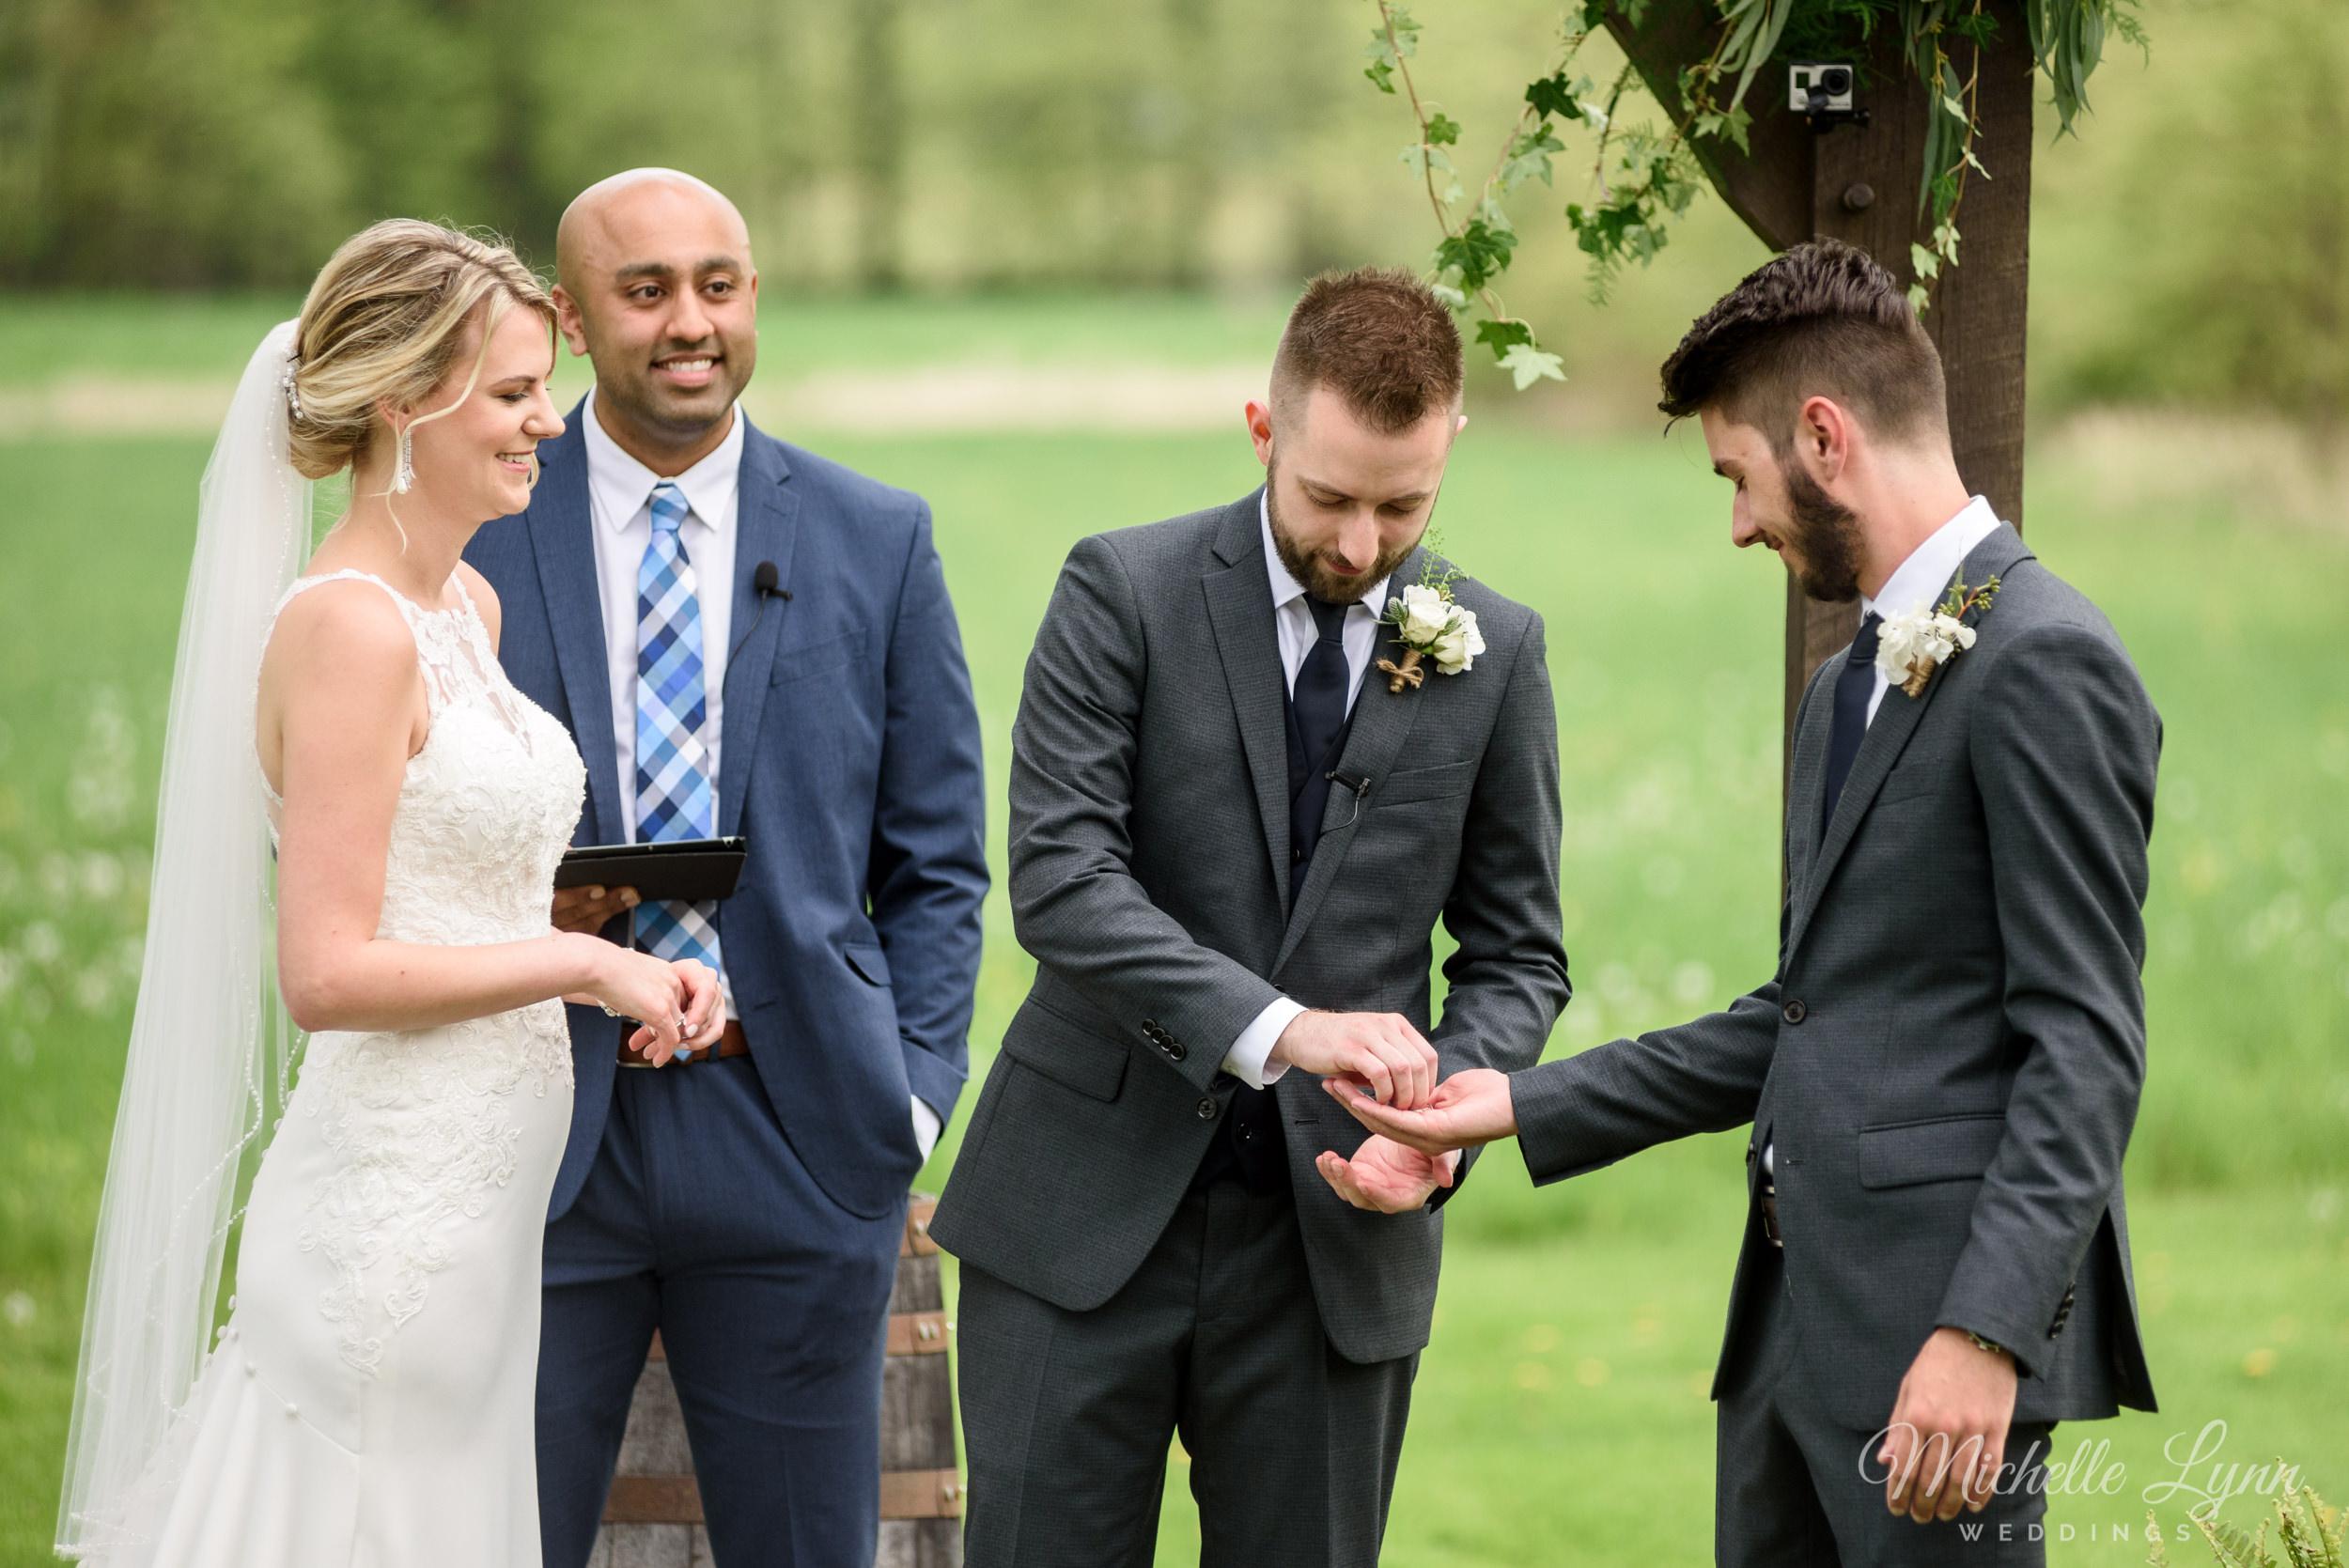 mlw-the-farm-bakery-and-events-wedding-photos-40.jpg